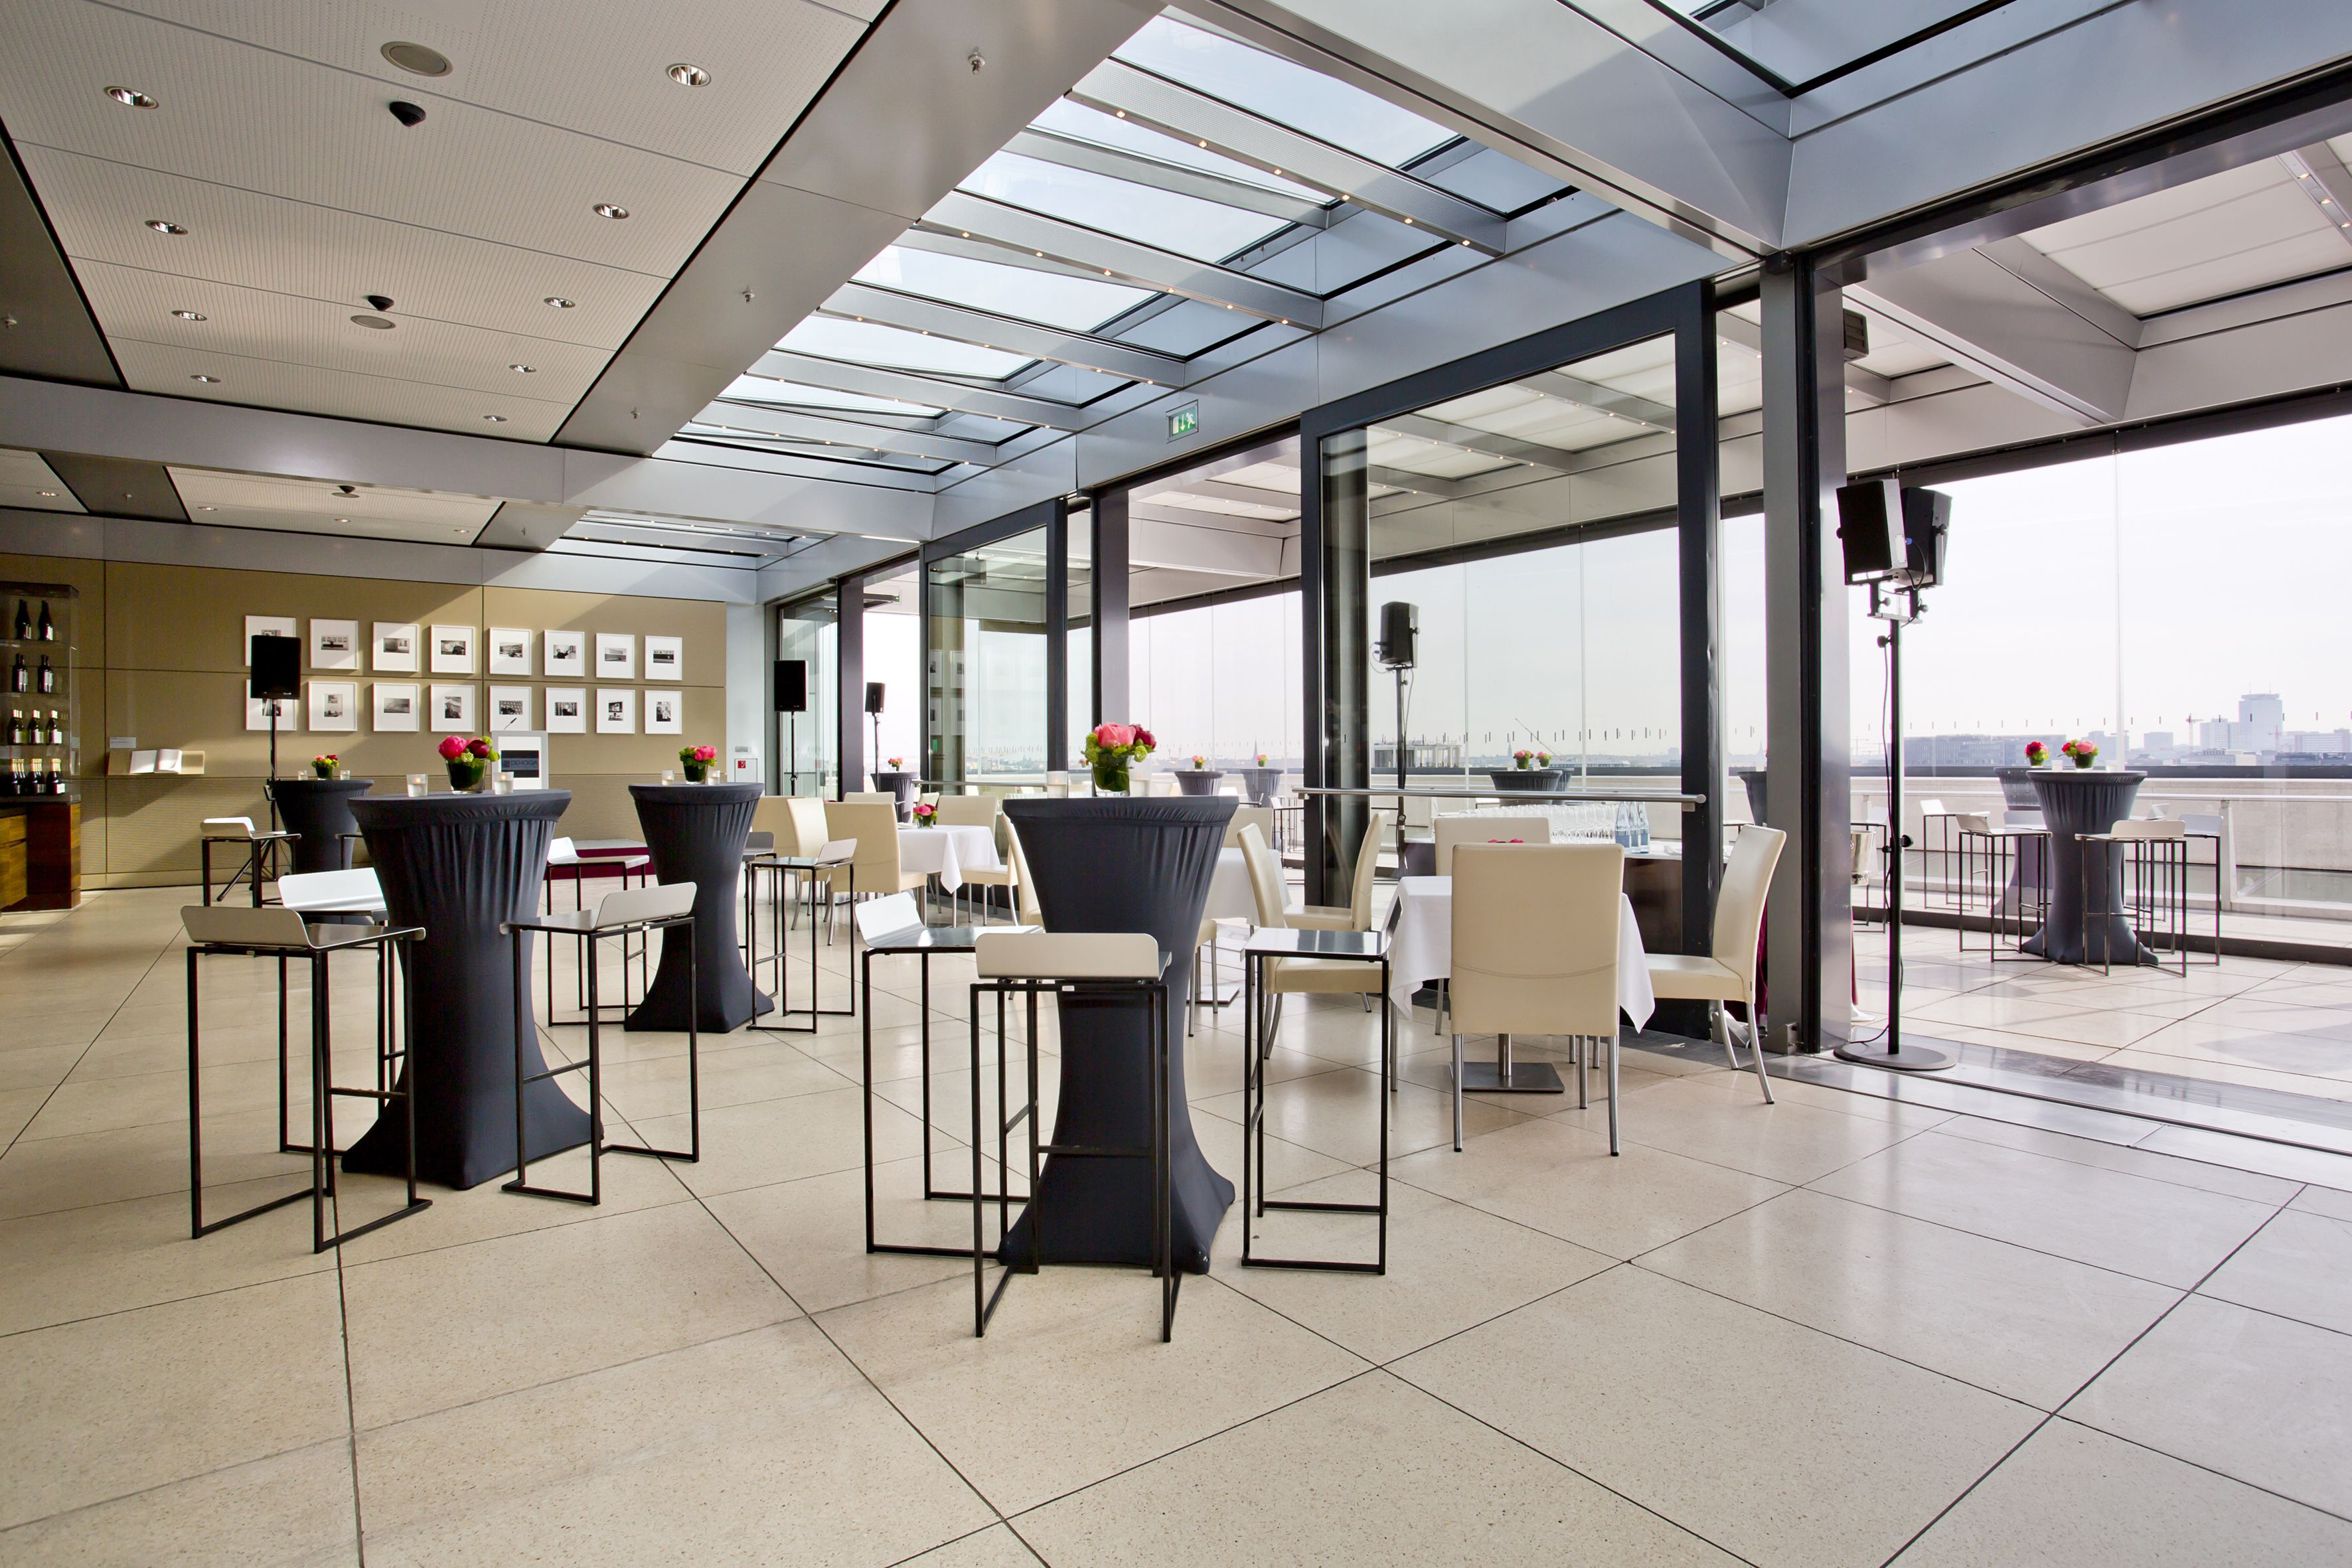 Kafer Dachgarten Restaurant Dachgarten Restaurant Berlin